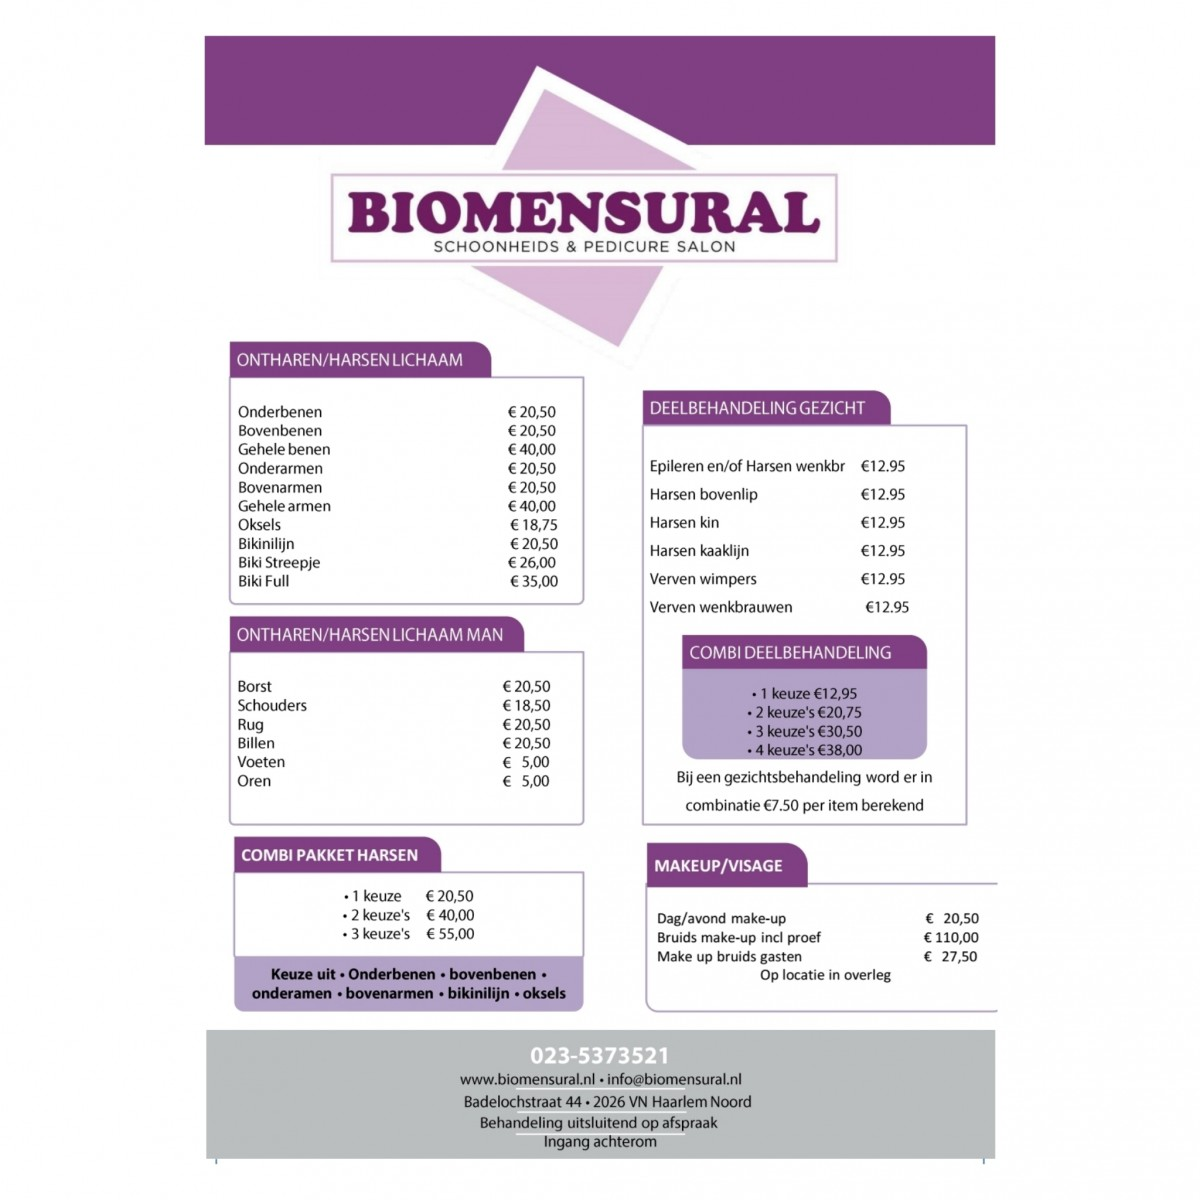 photo - Biomensural Schoonheids & Pedicure Salon